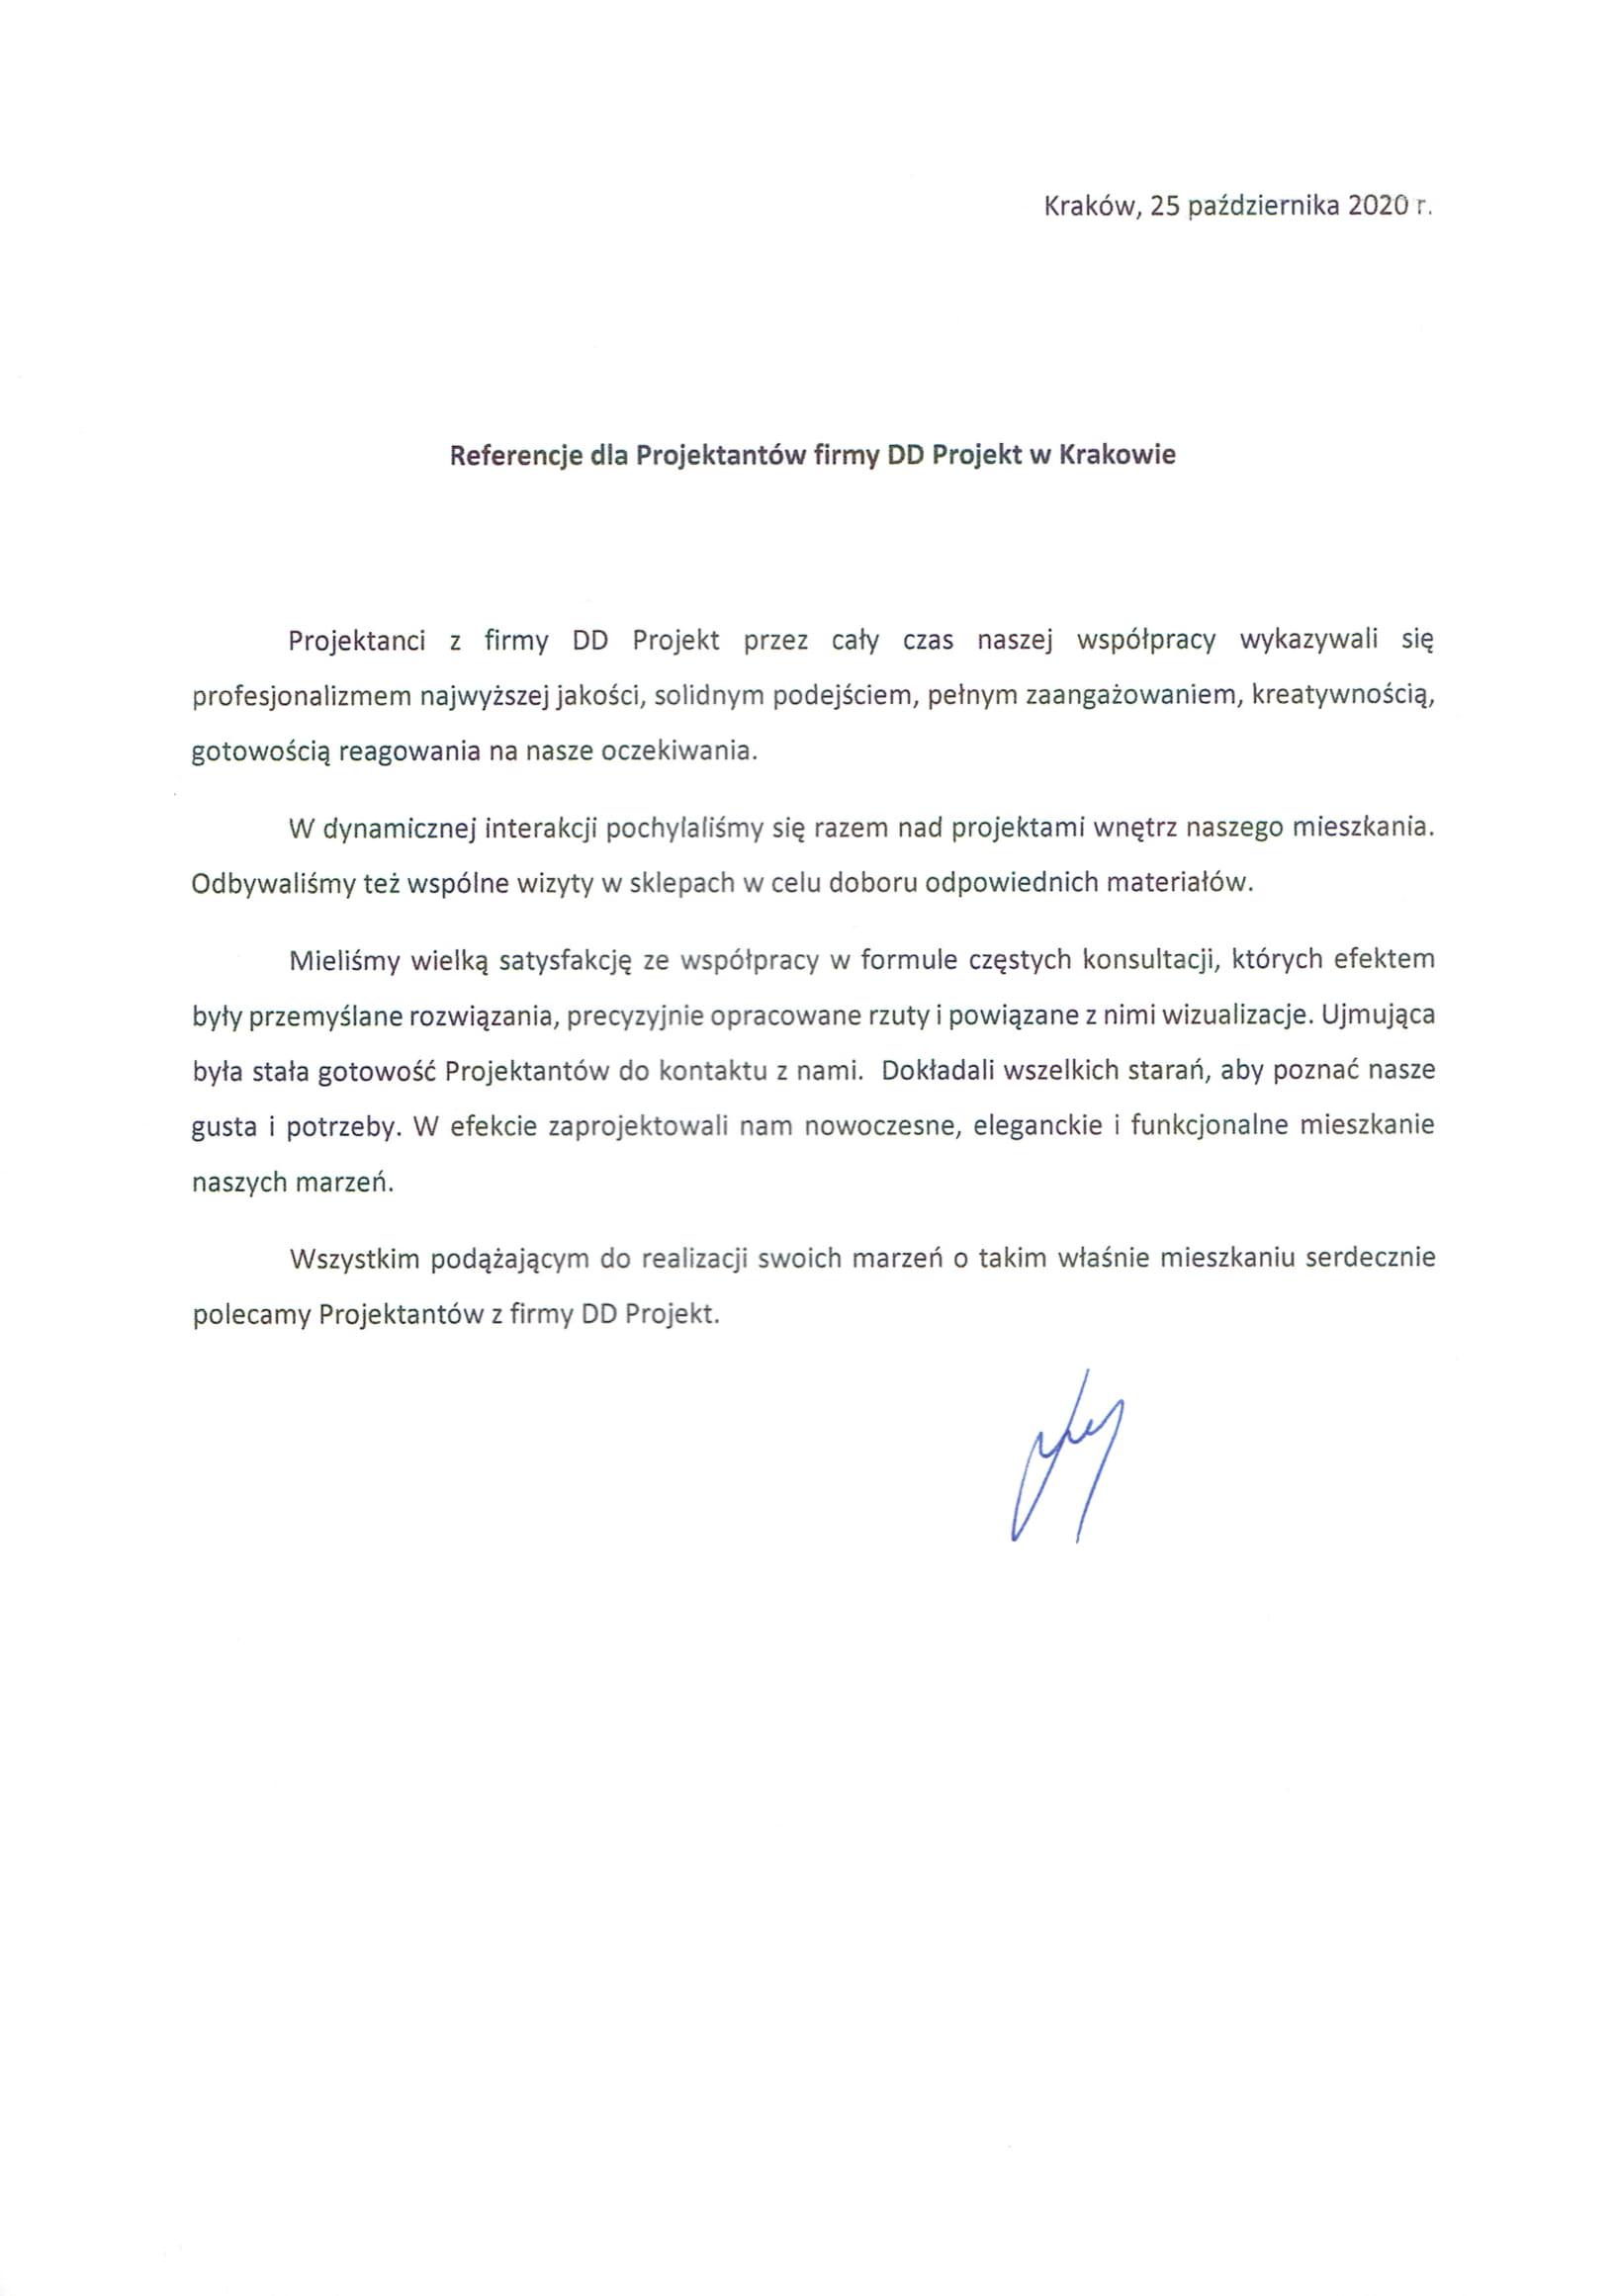 https://ddprojekt.pl/wp-content/uploads/2020/10/Referencje-P.Piech-1.jpg